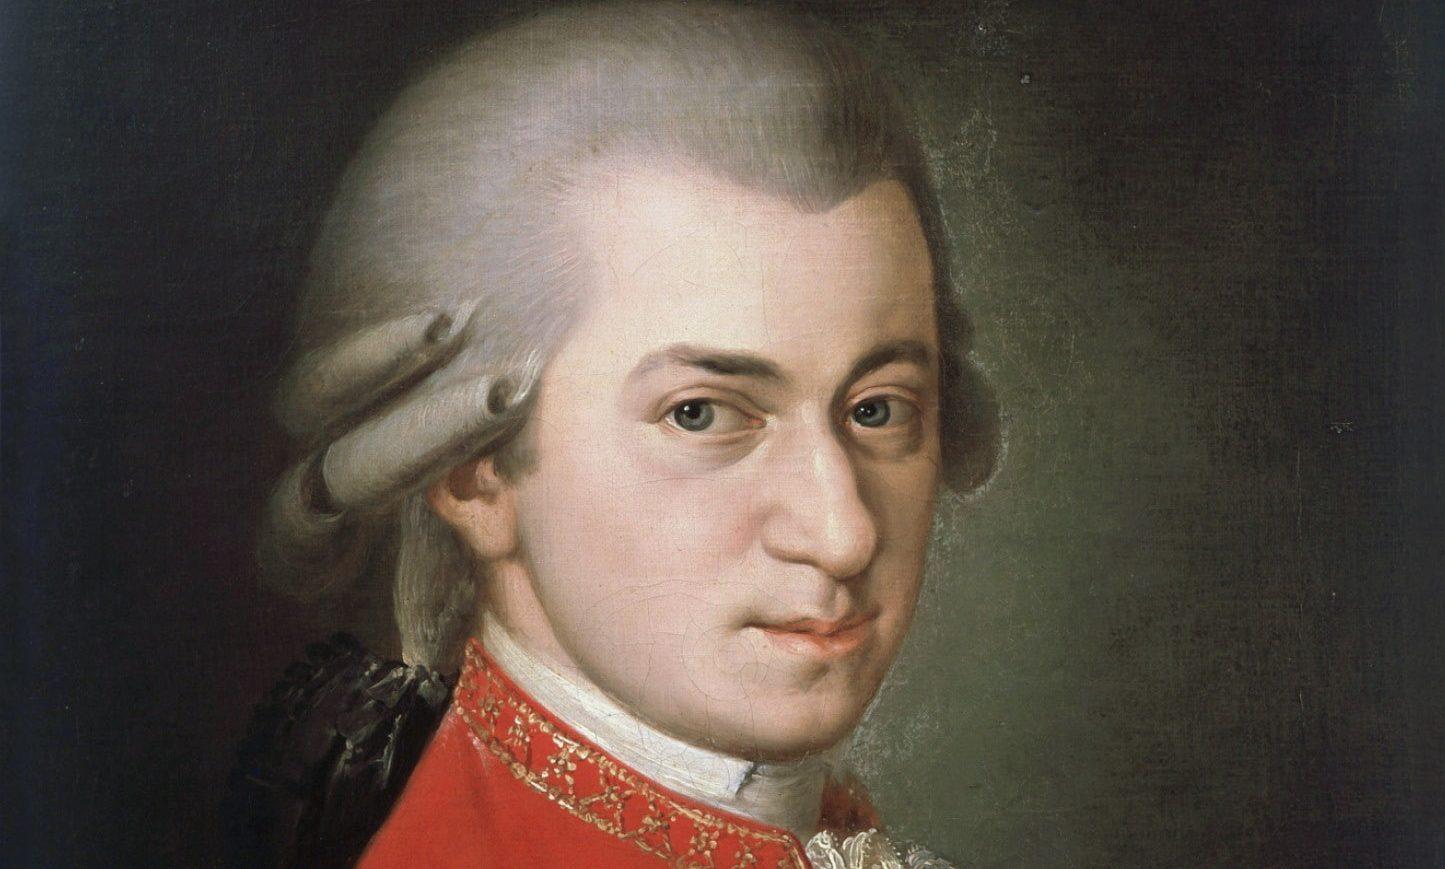 Rondo alla Turca – Wolfgang Amadeus Mozart